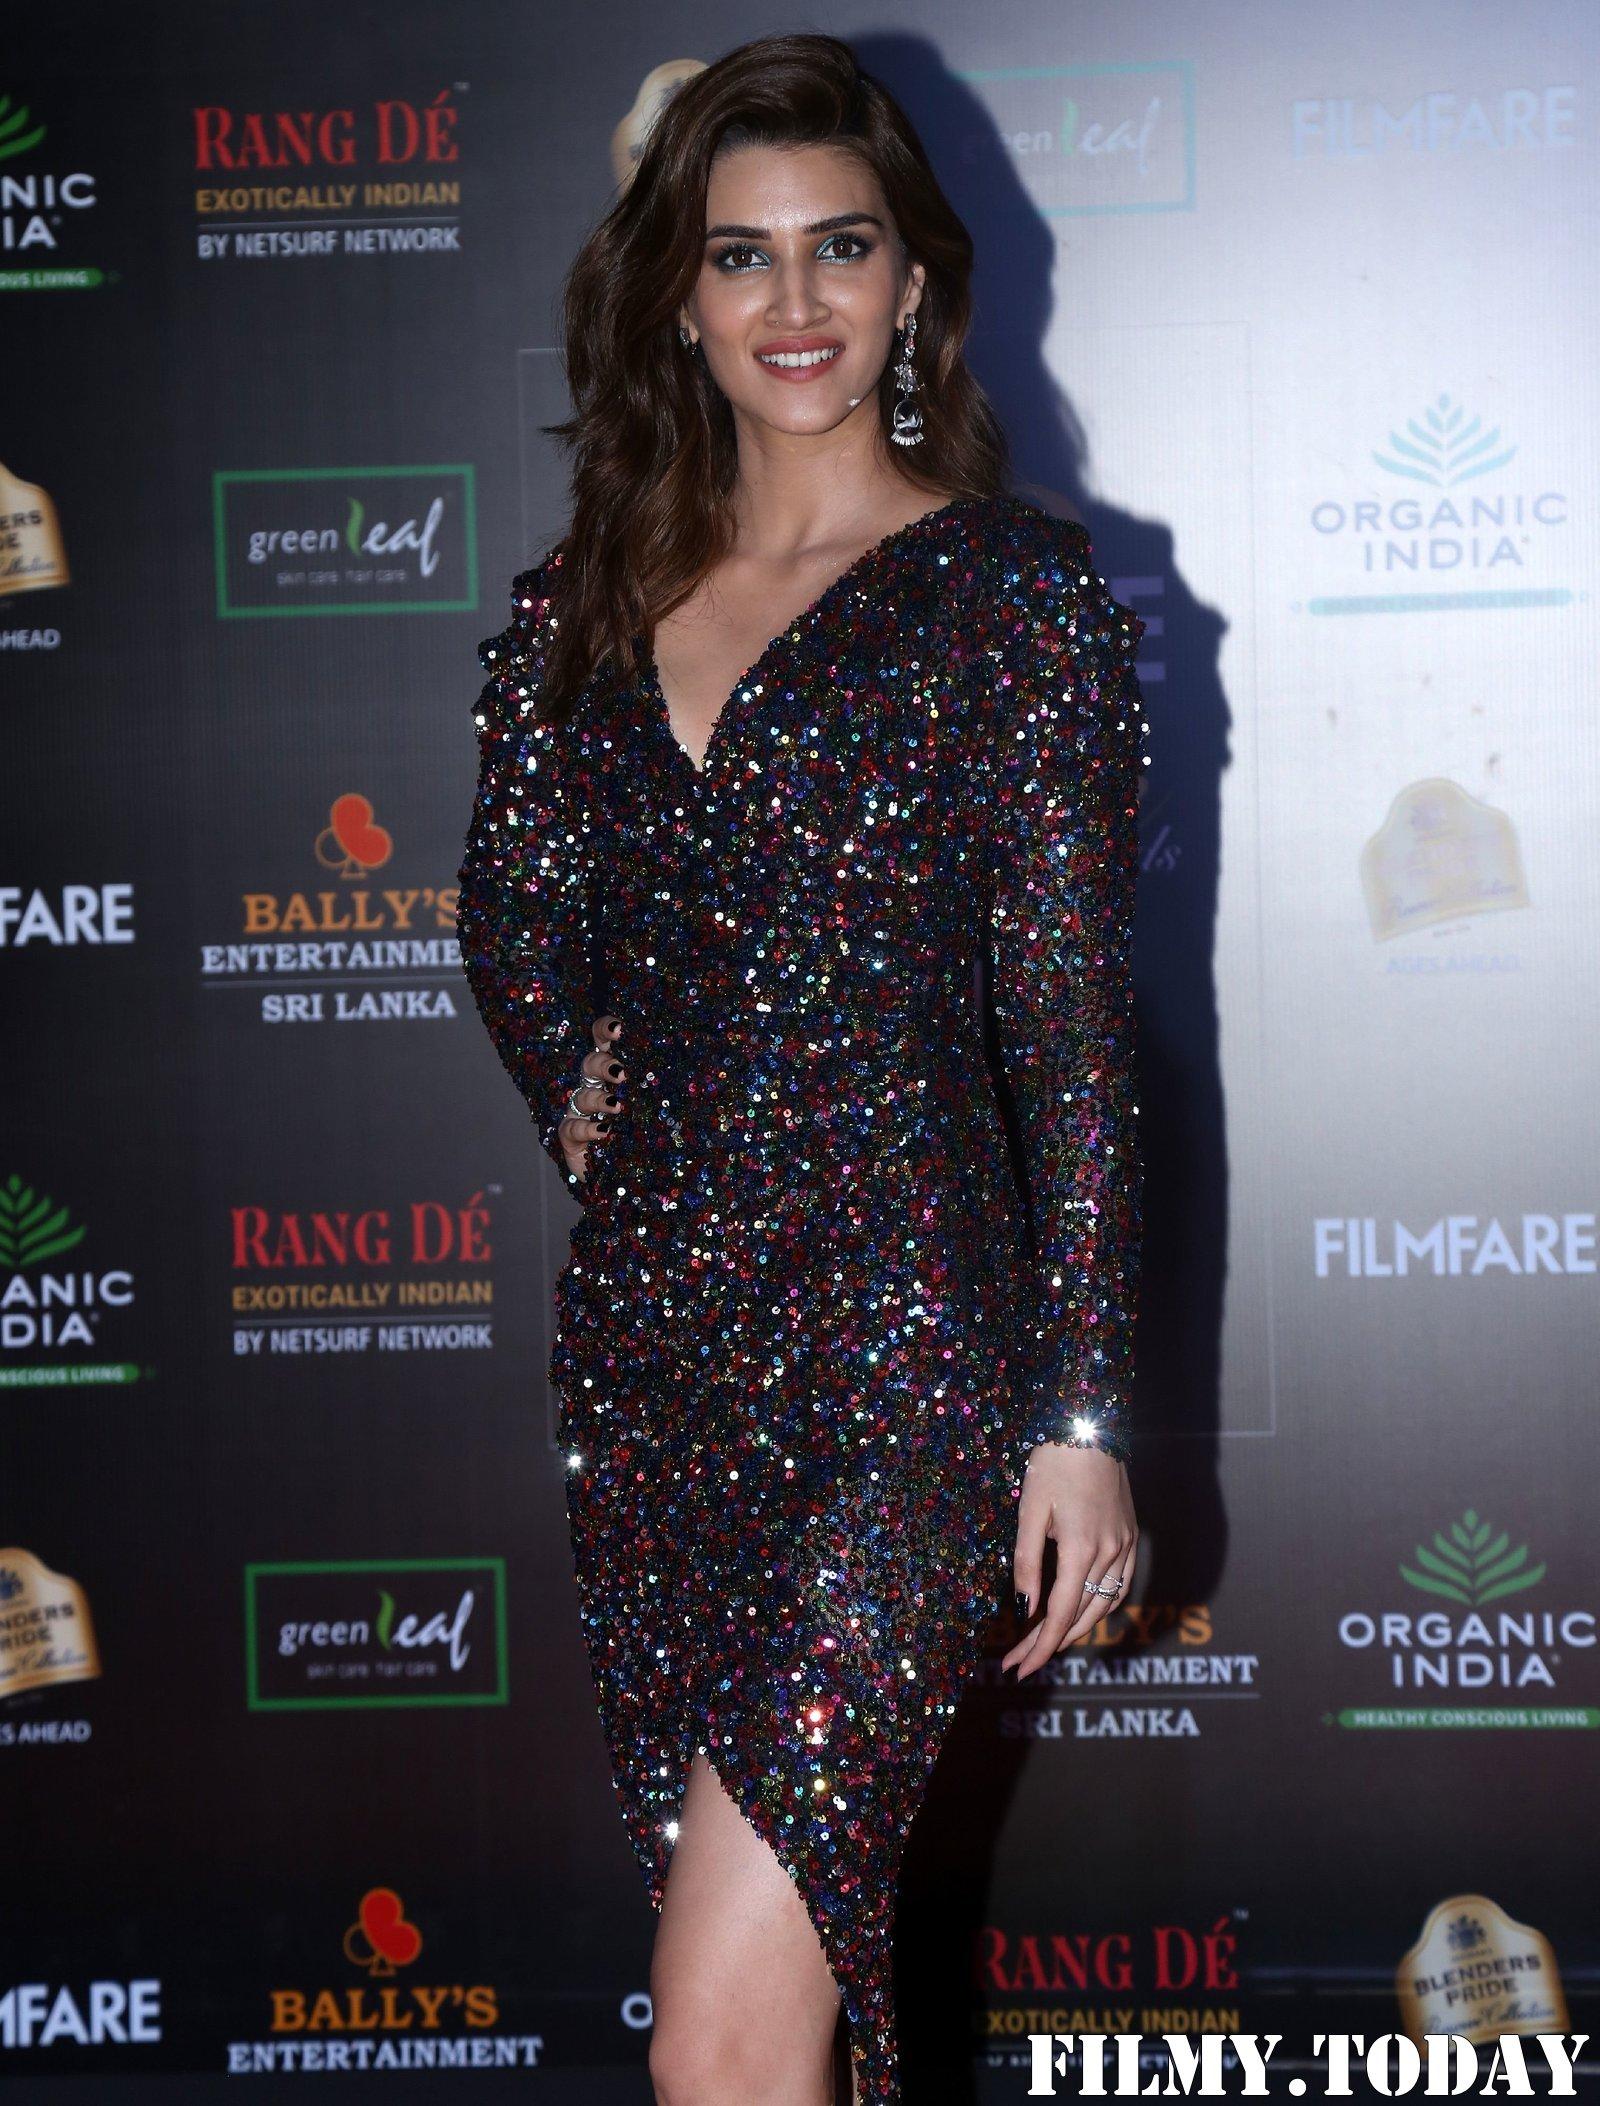 Kriti Sanon - Photos: Celebs At Filmfare Glamour & Style Awards 2019 At Taj Lands End | Picture 1704688